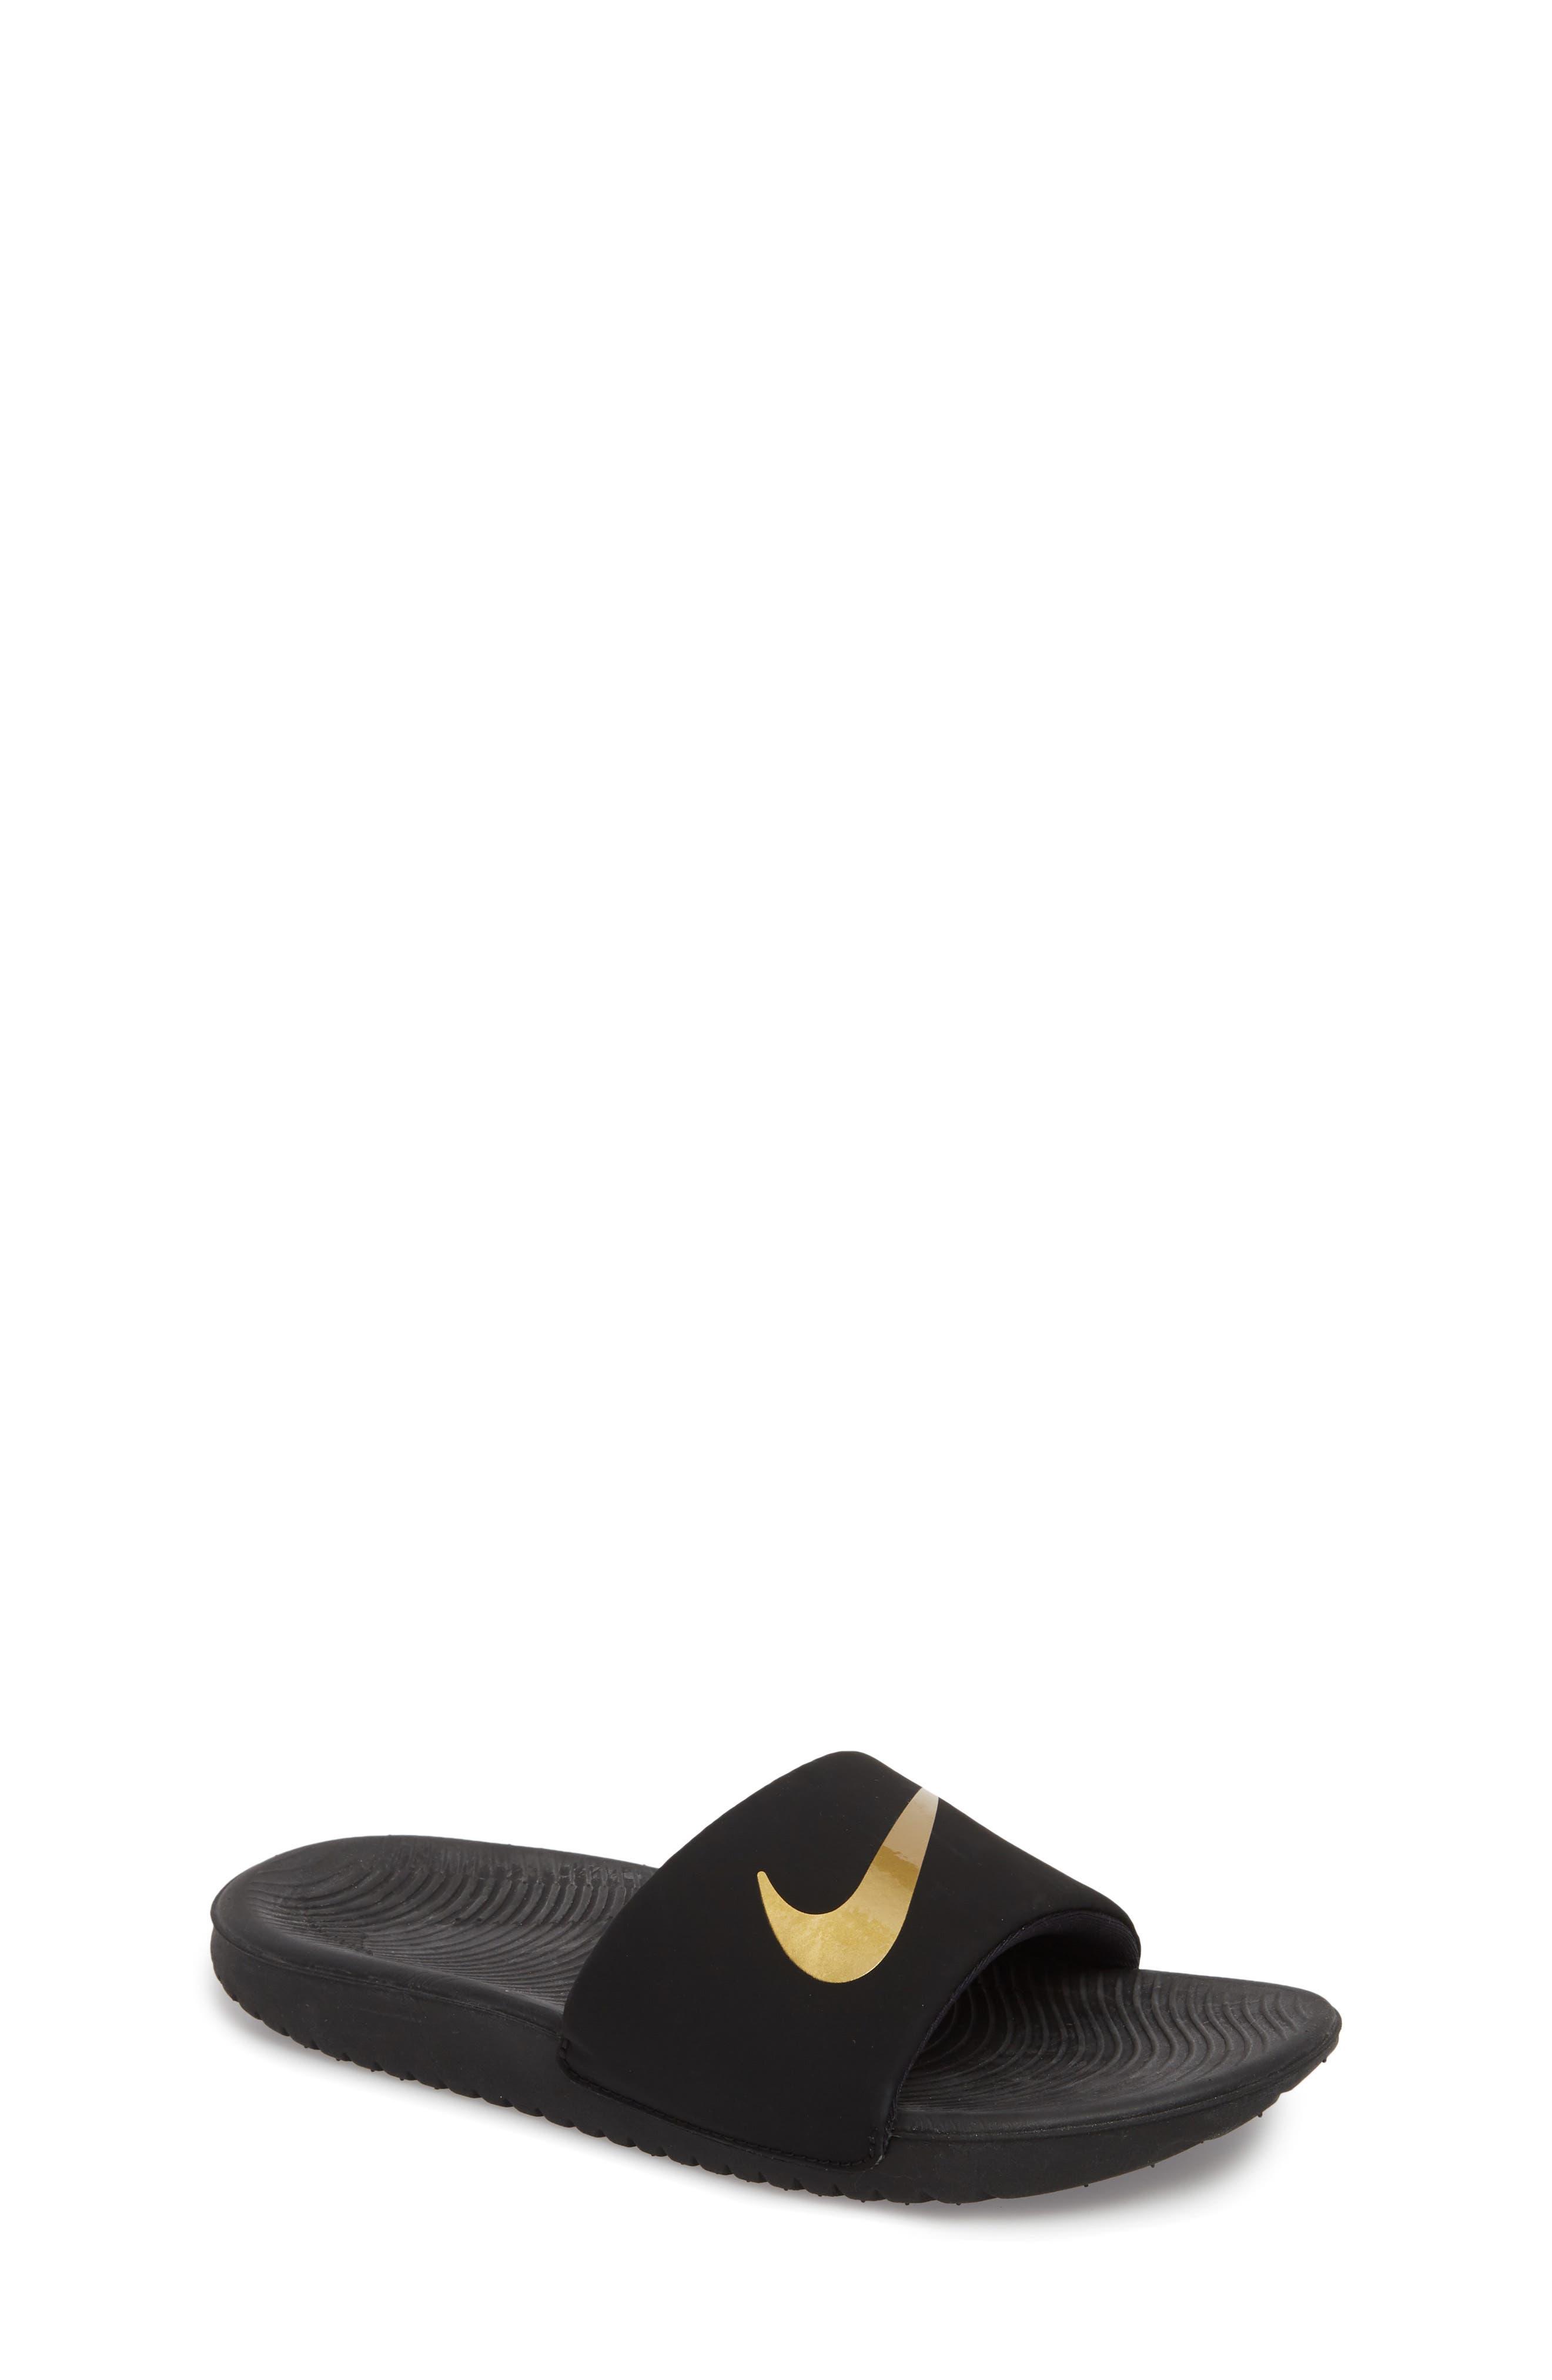 NIKE 'Kawa' Slide Sandal, Main, color, BLACK/ METALLIC GOLD